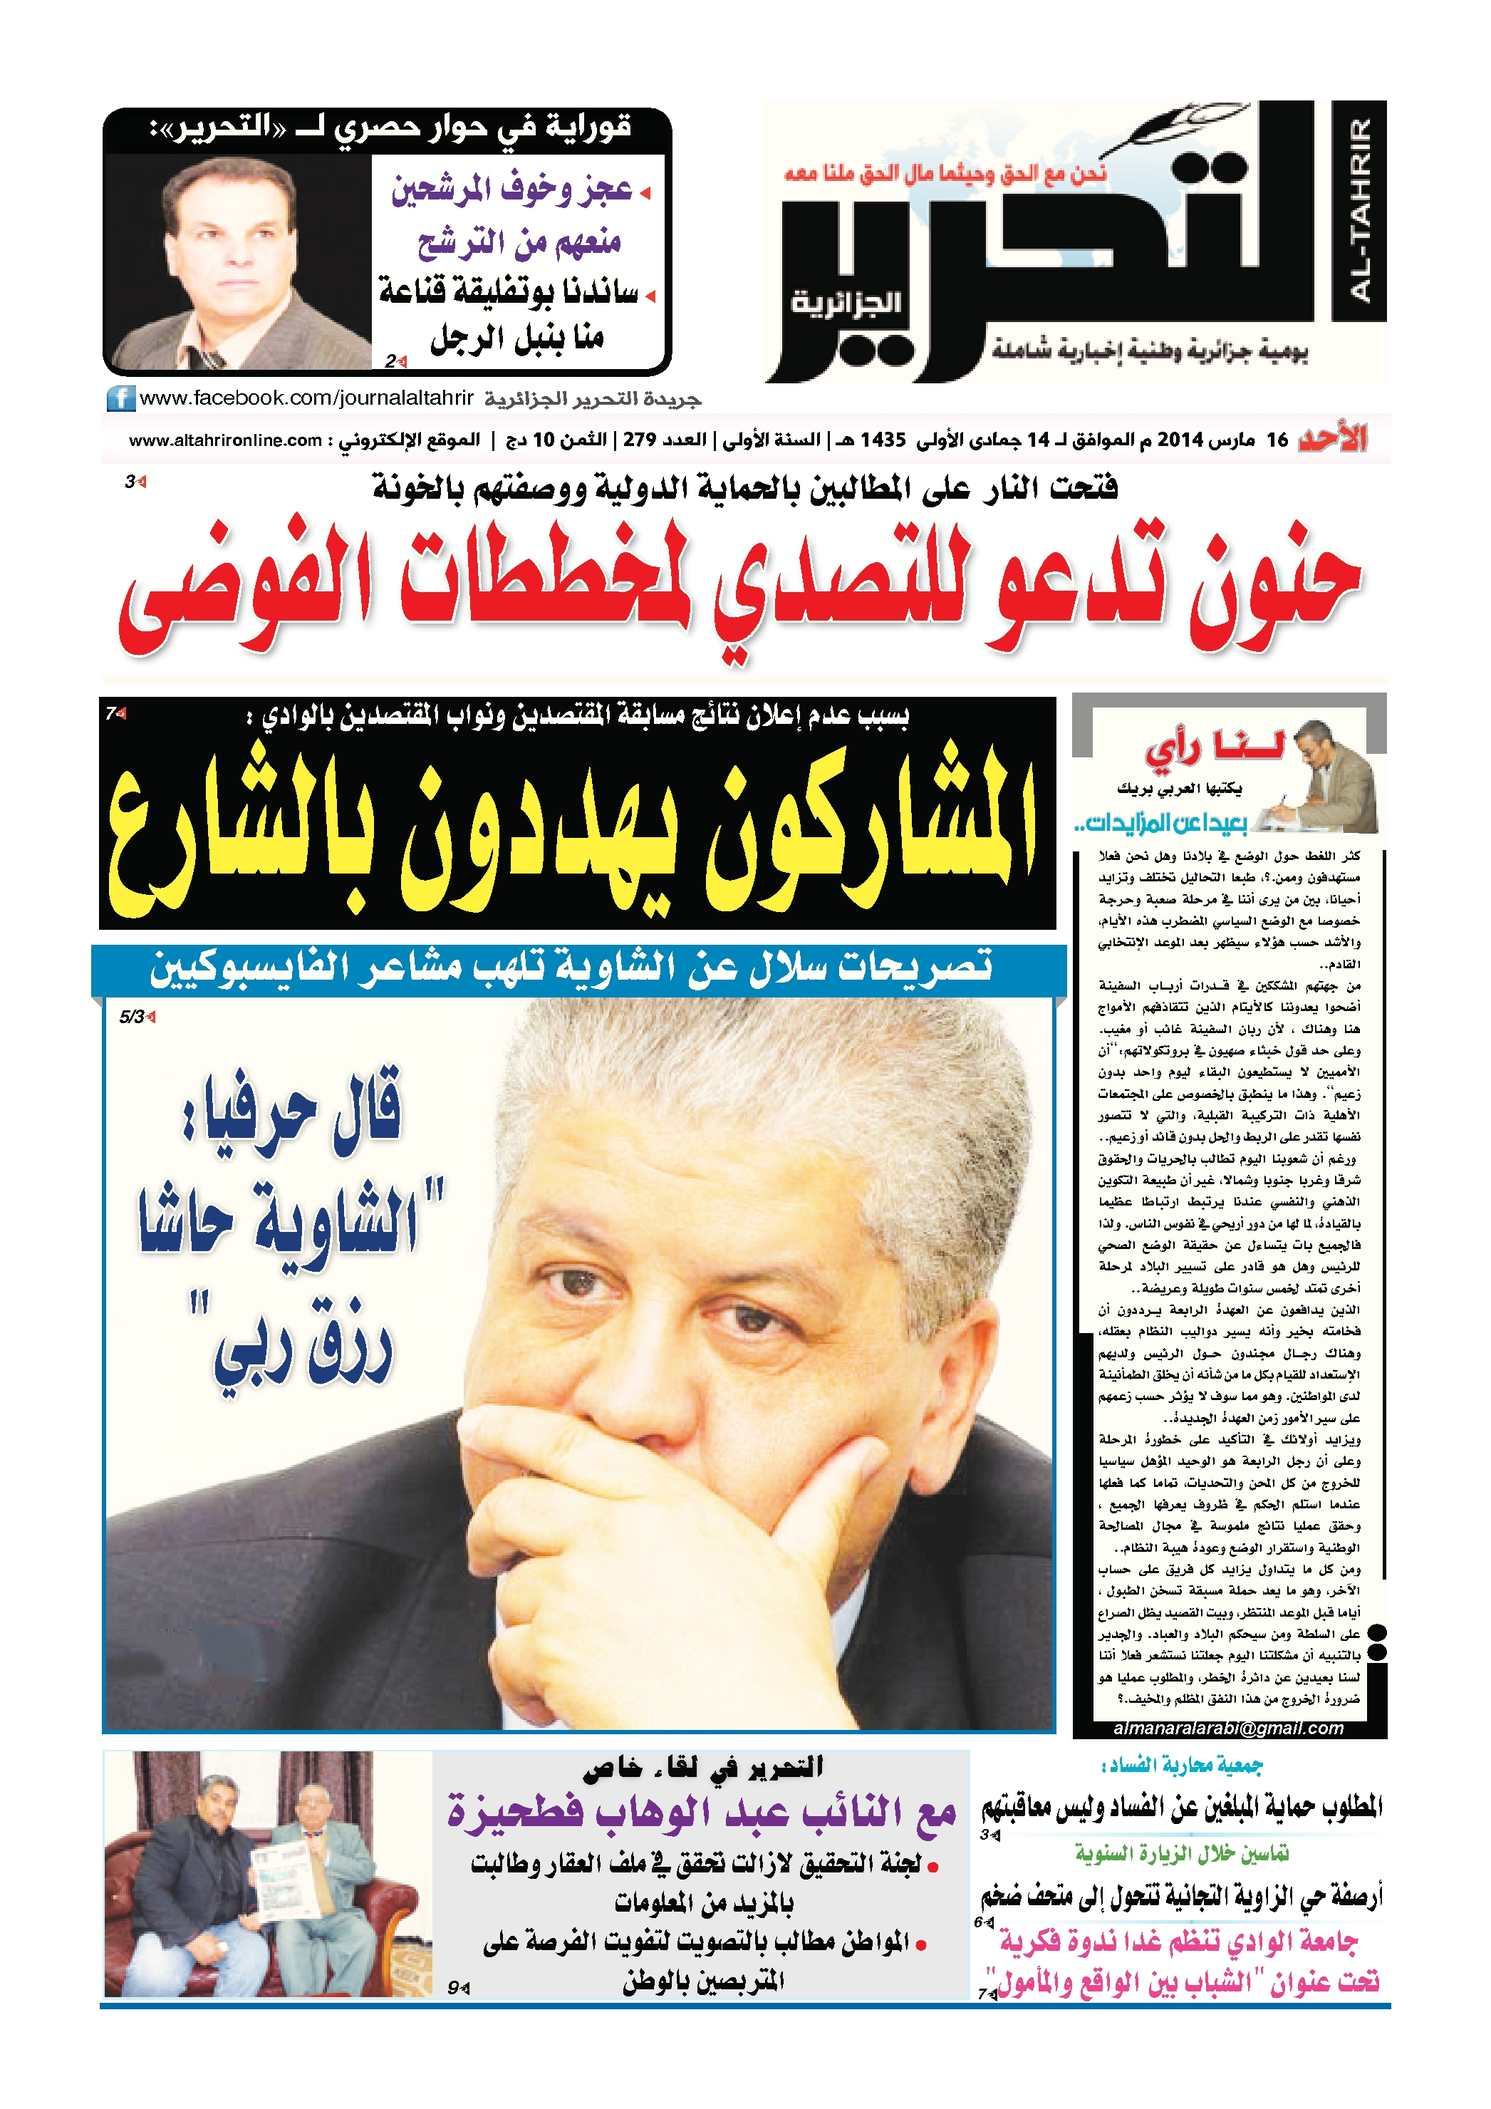 c9fc12736 Calaméo - جريدة التحرير الجزائرية العدد 279